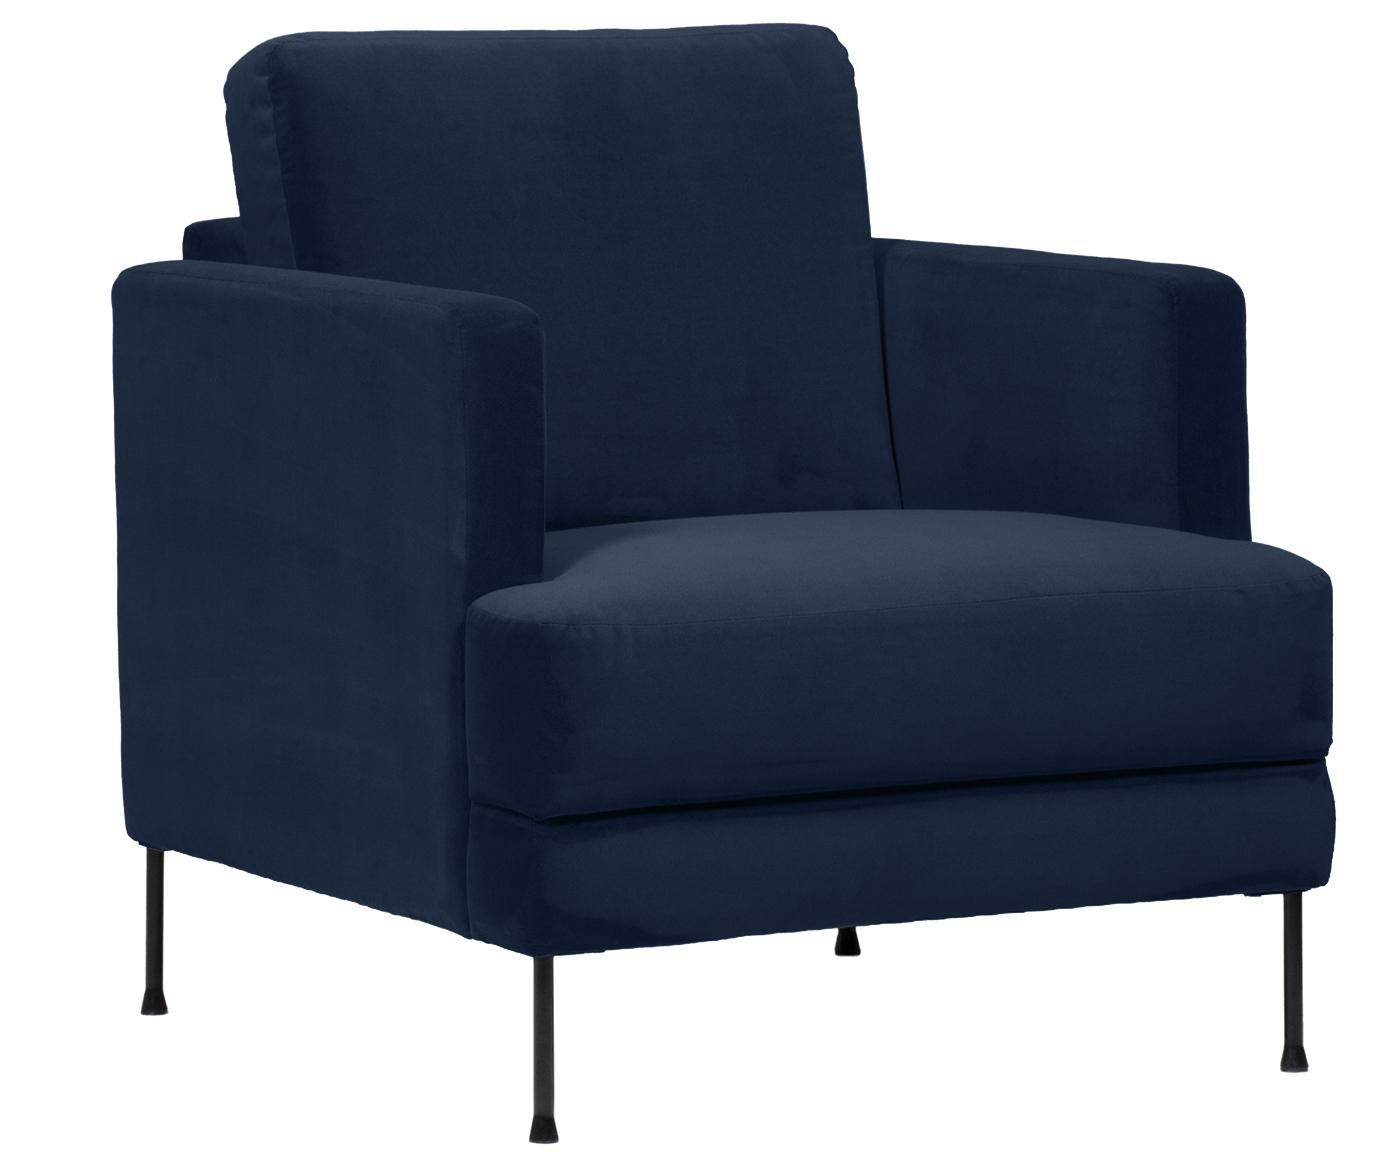 Fluwelen fauteuil Fluente, Bekleding: fluweel (hoogwaardig poly, Frame: massief grenenhout, Poten: gelakt metaal, Donkerblauw, B 76 x D 83 cm